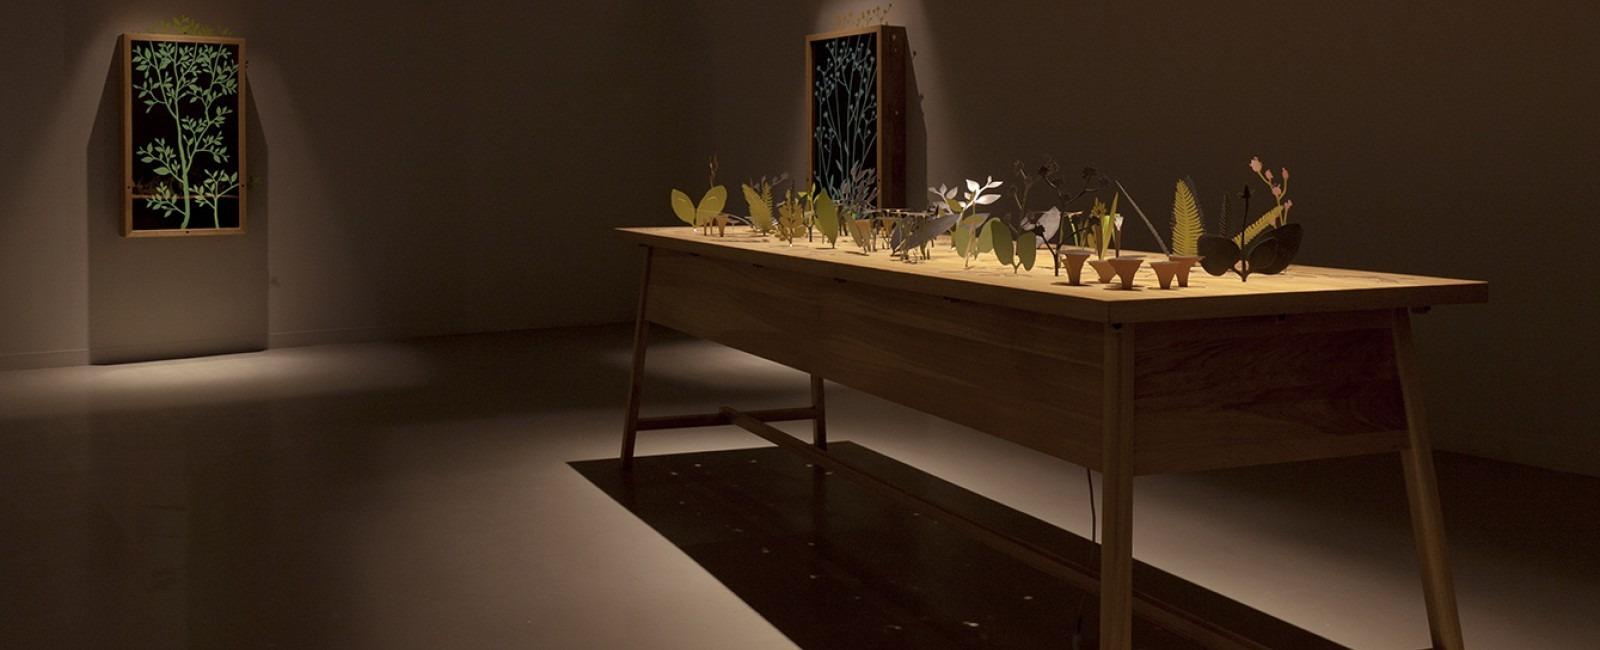 Perrier-Jouët presenta ephemerā en Design Miami/2014